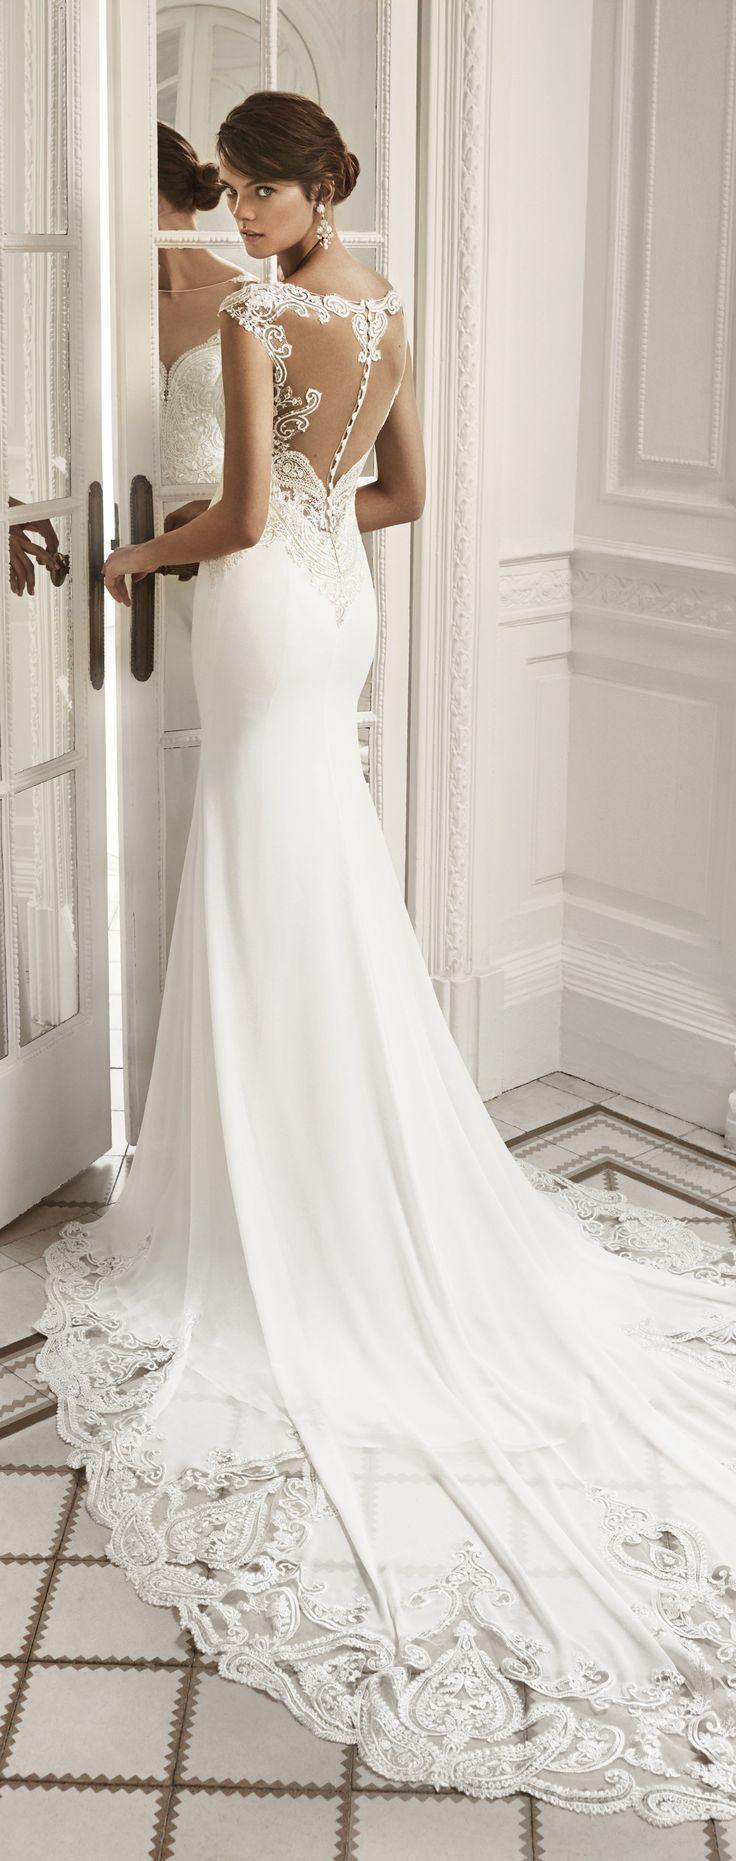 Wedding Dress by Luna Novias